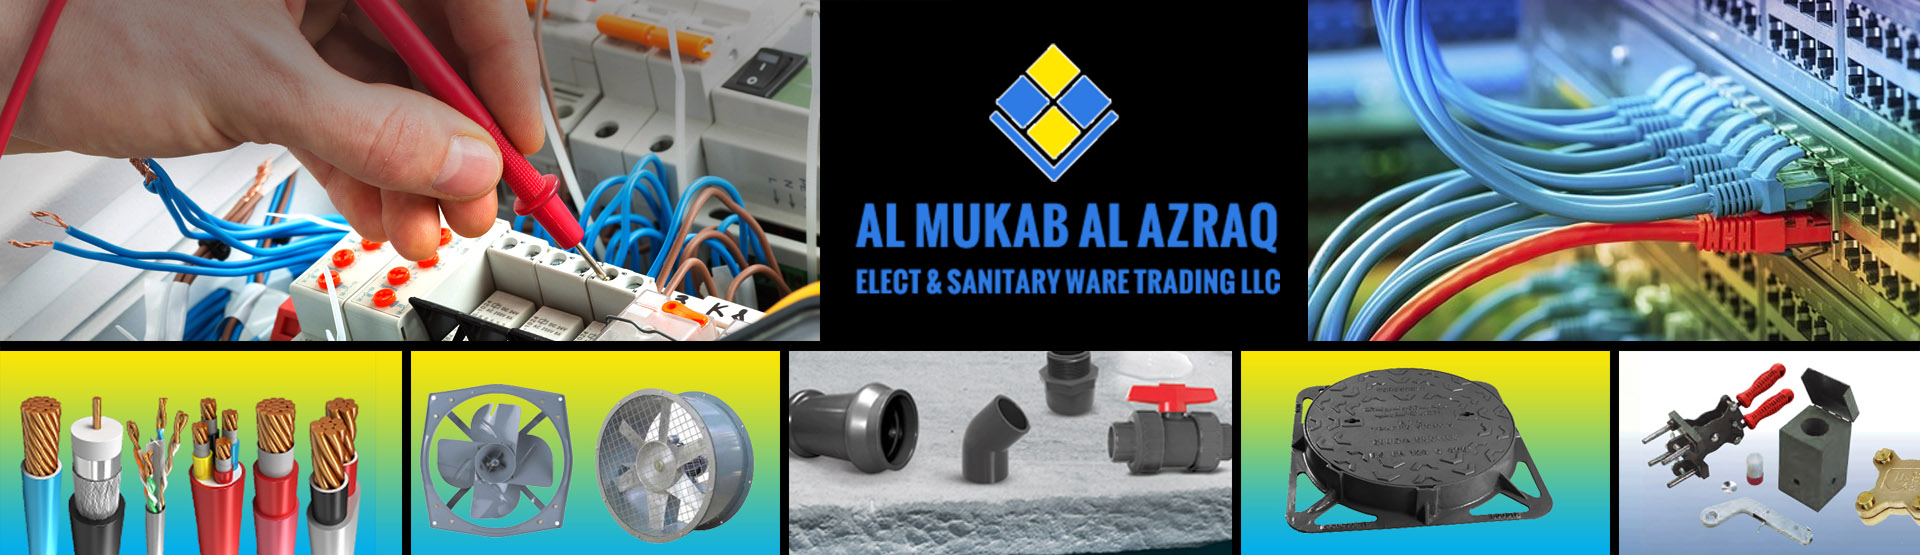 AL MUKAB AL AZRAQ ELECT & SANITARY WARE TR. LLC